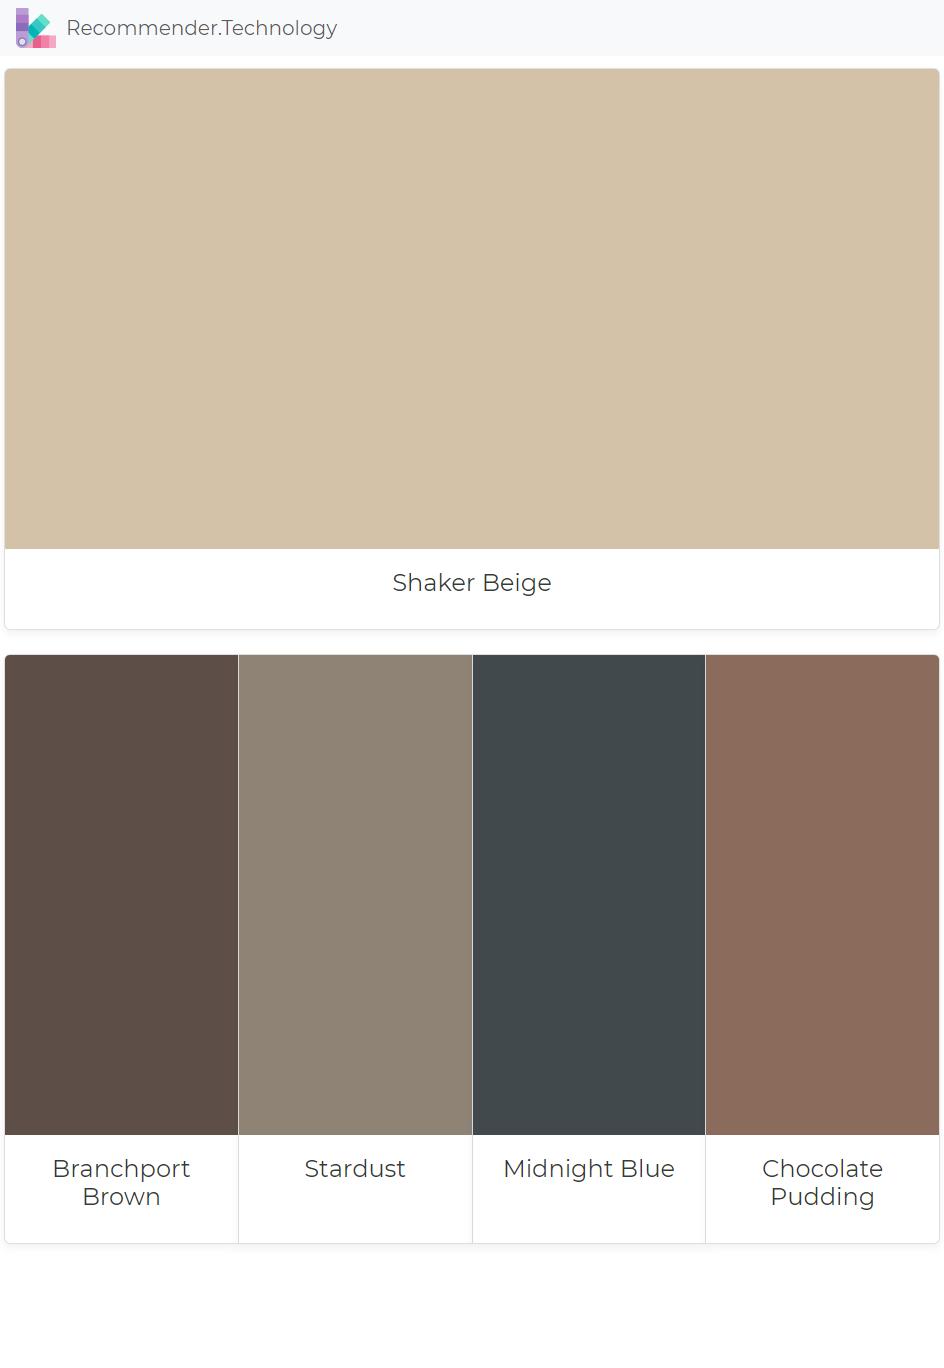 Colori Per Pittura Esterna Casa shaker beige: branchport brown, stardust, midnight blue